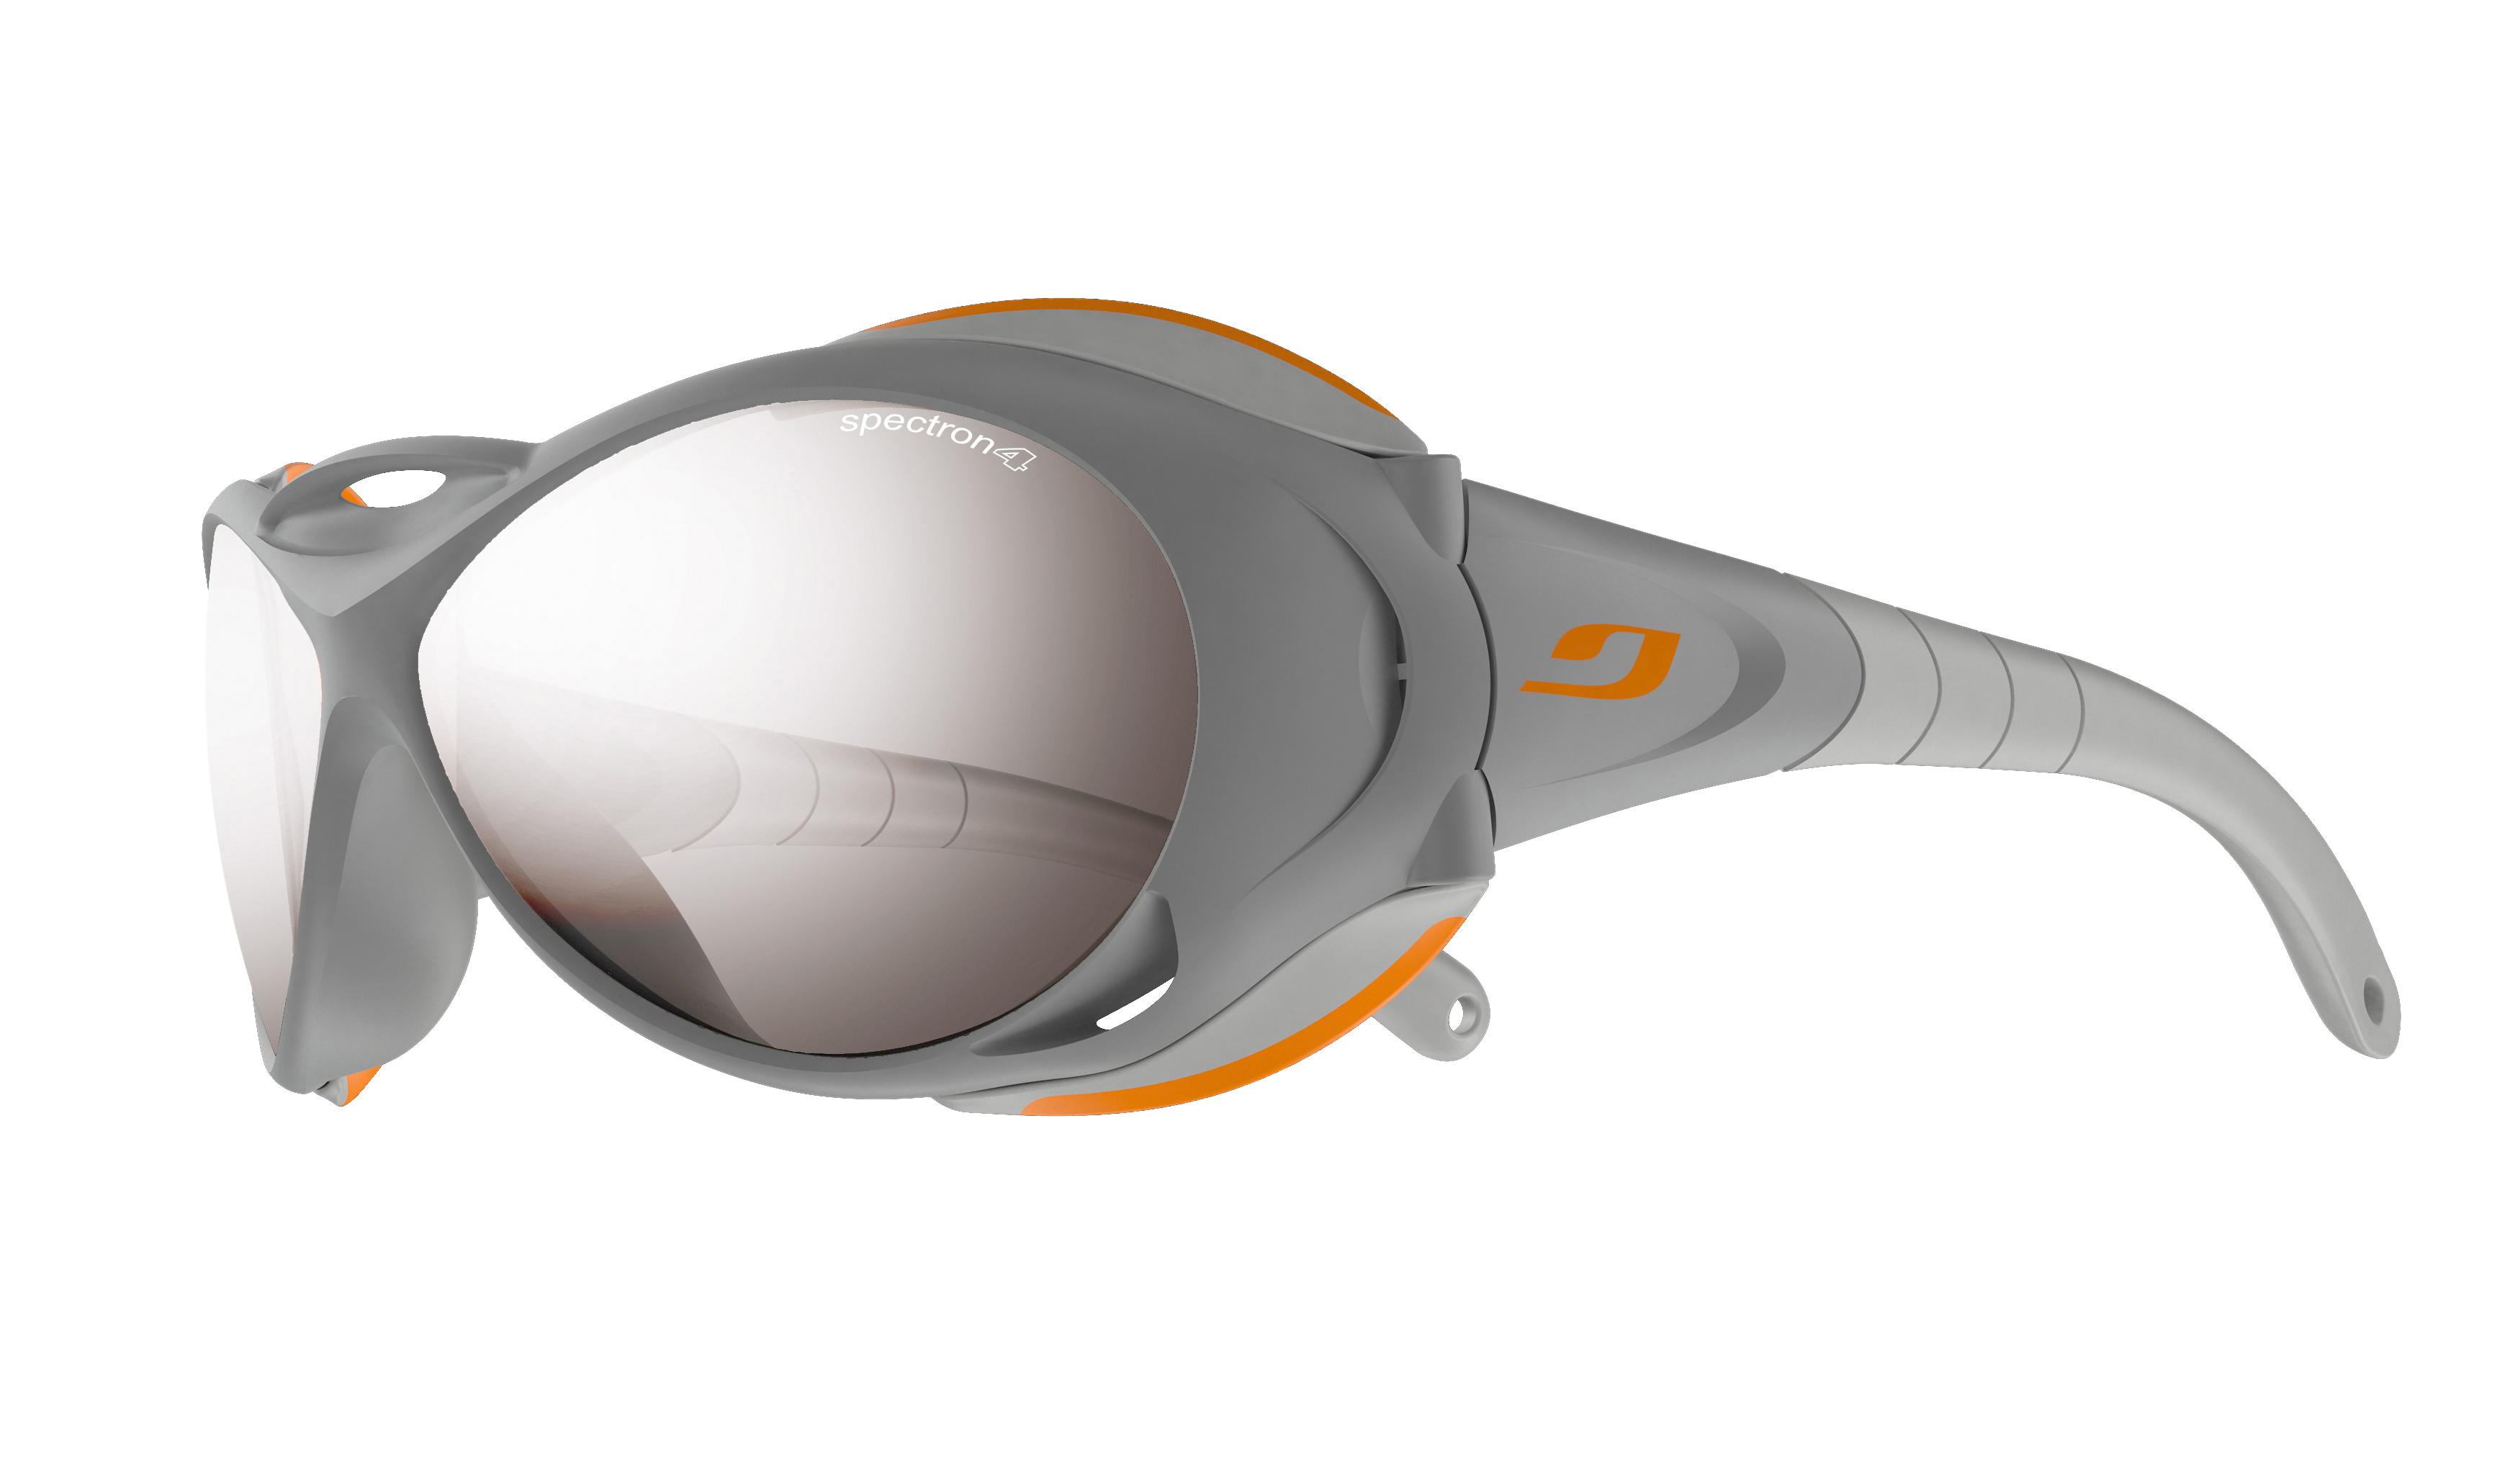 8d71762e0a Julbo Explorer Sunglasses - Unisex